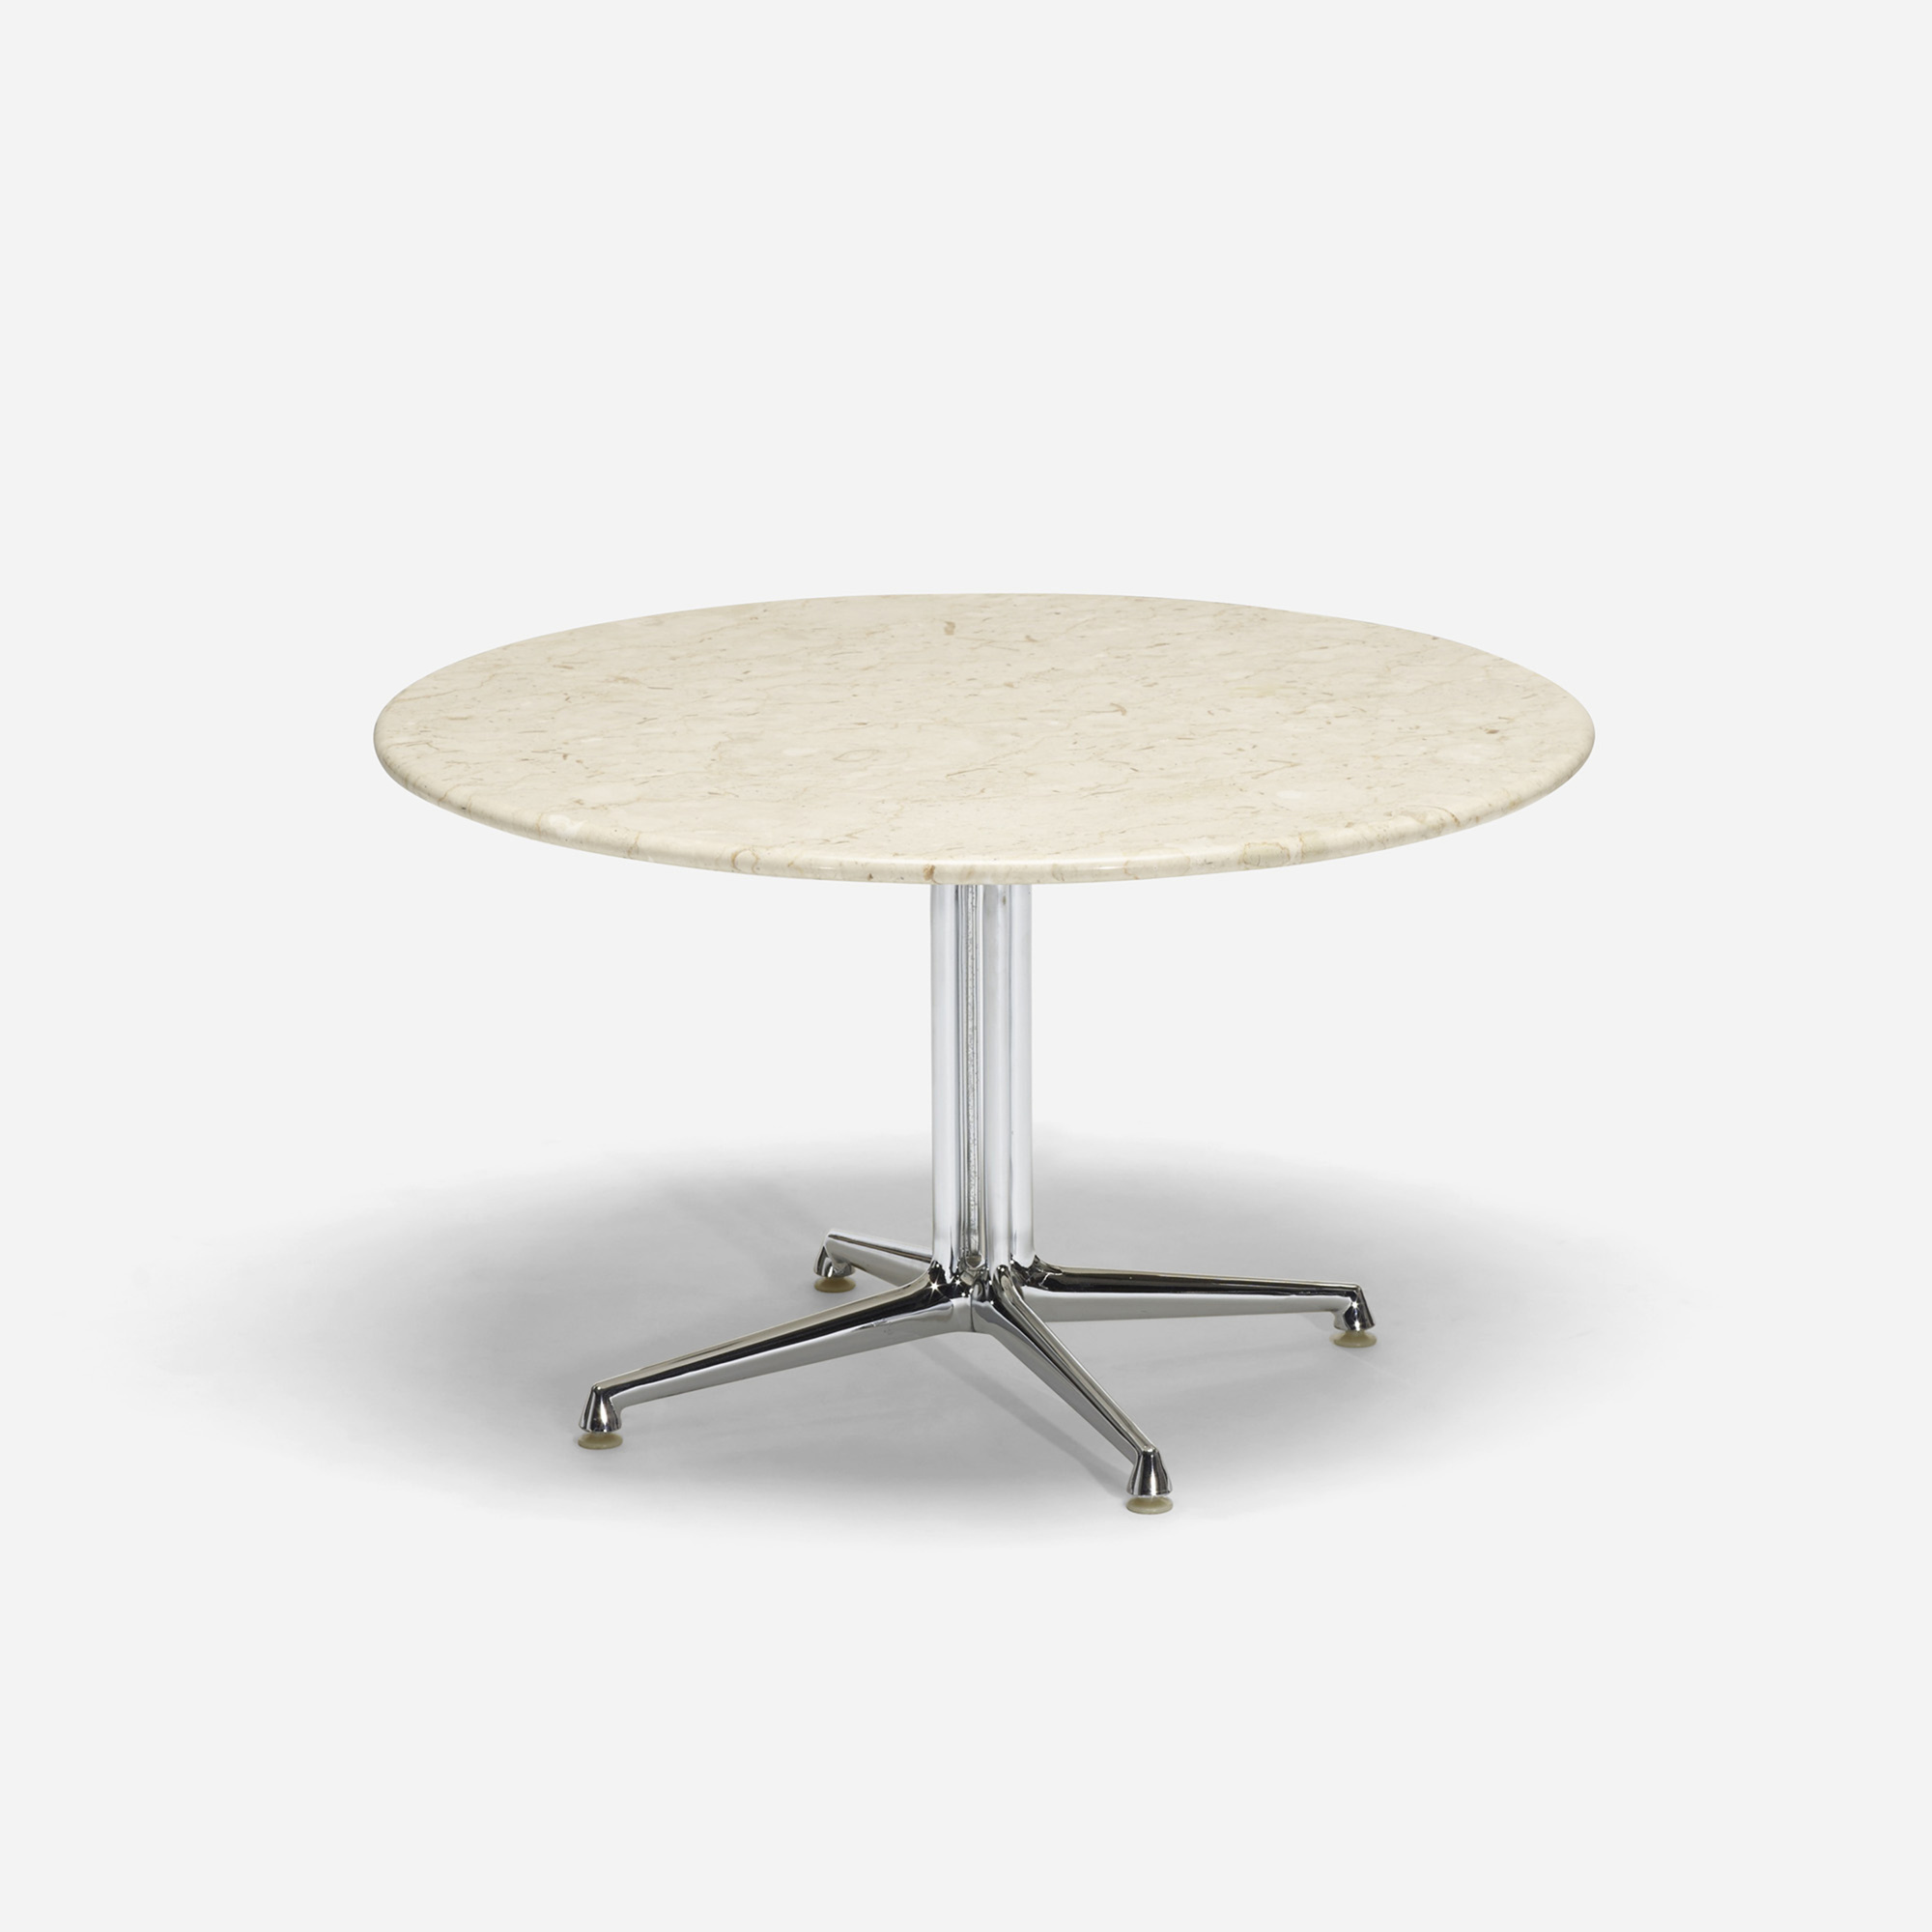 250: Charles and Ray Eames / La Fonda coffee table (1 of 3)